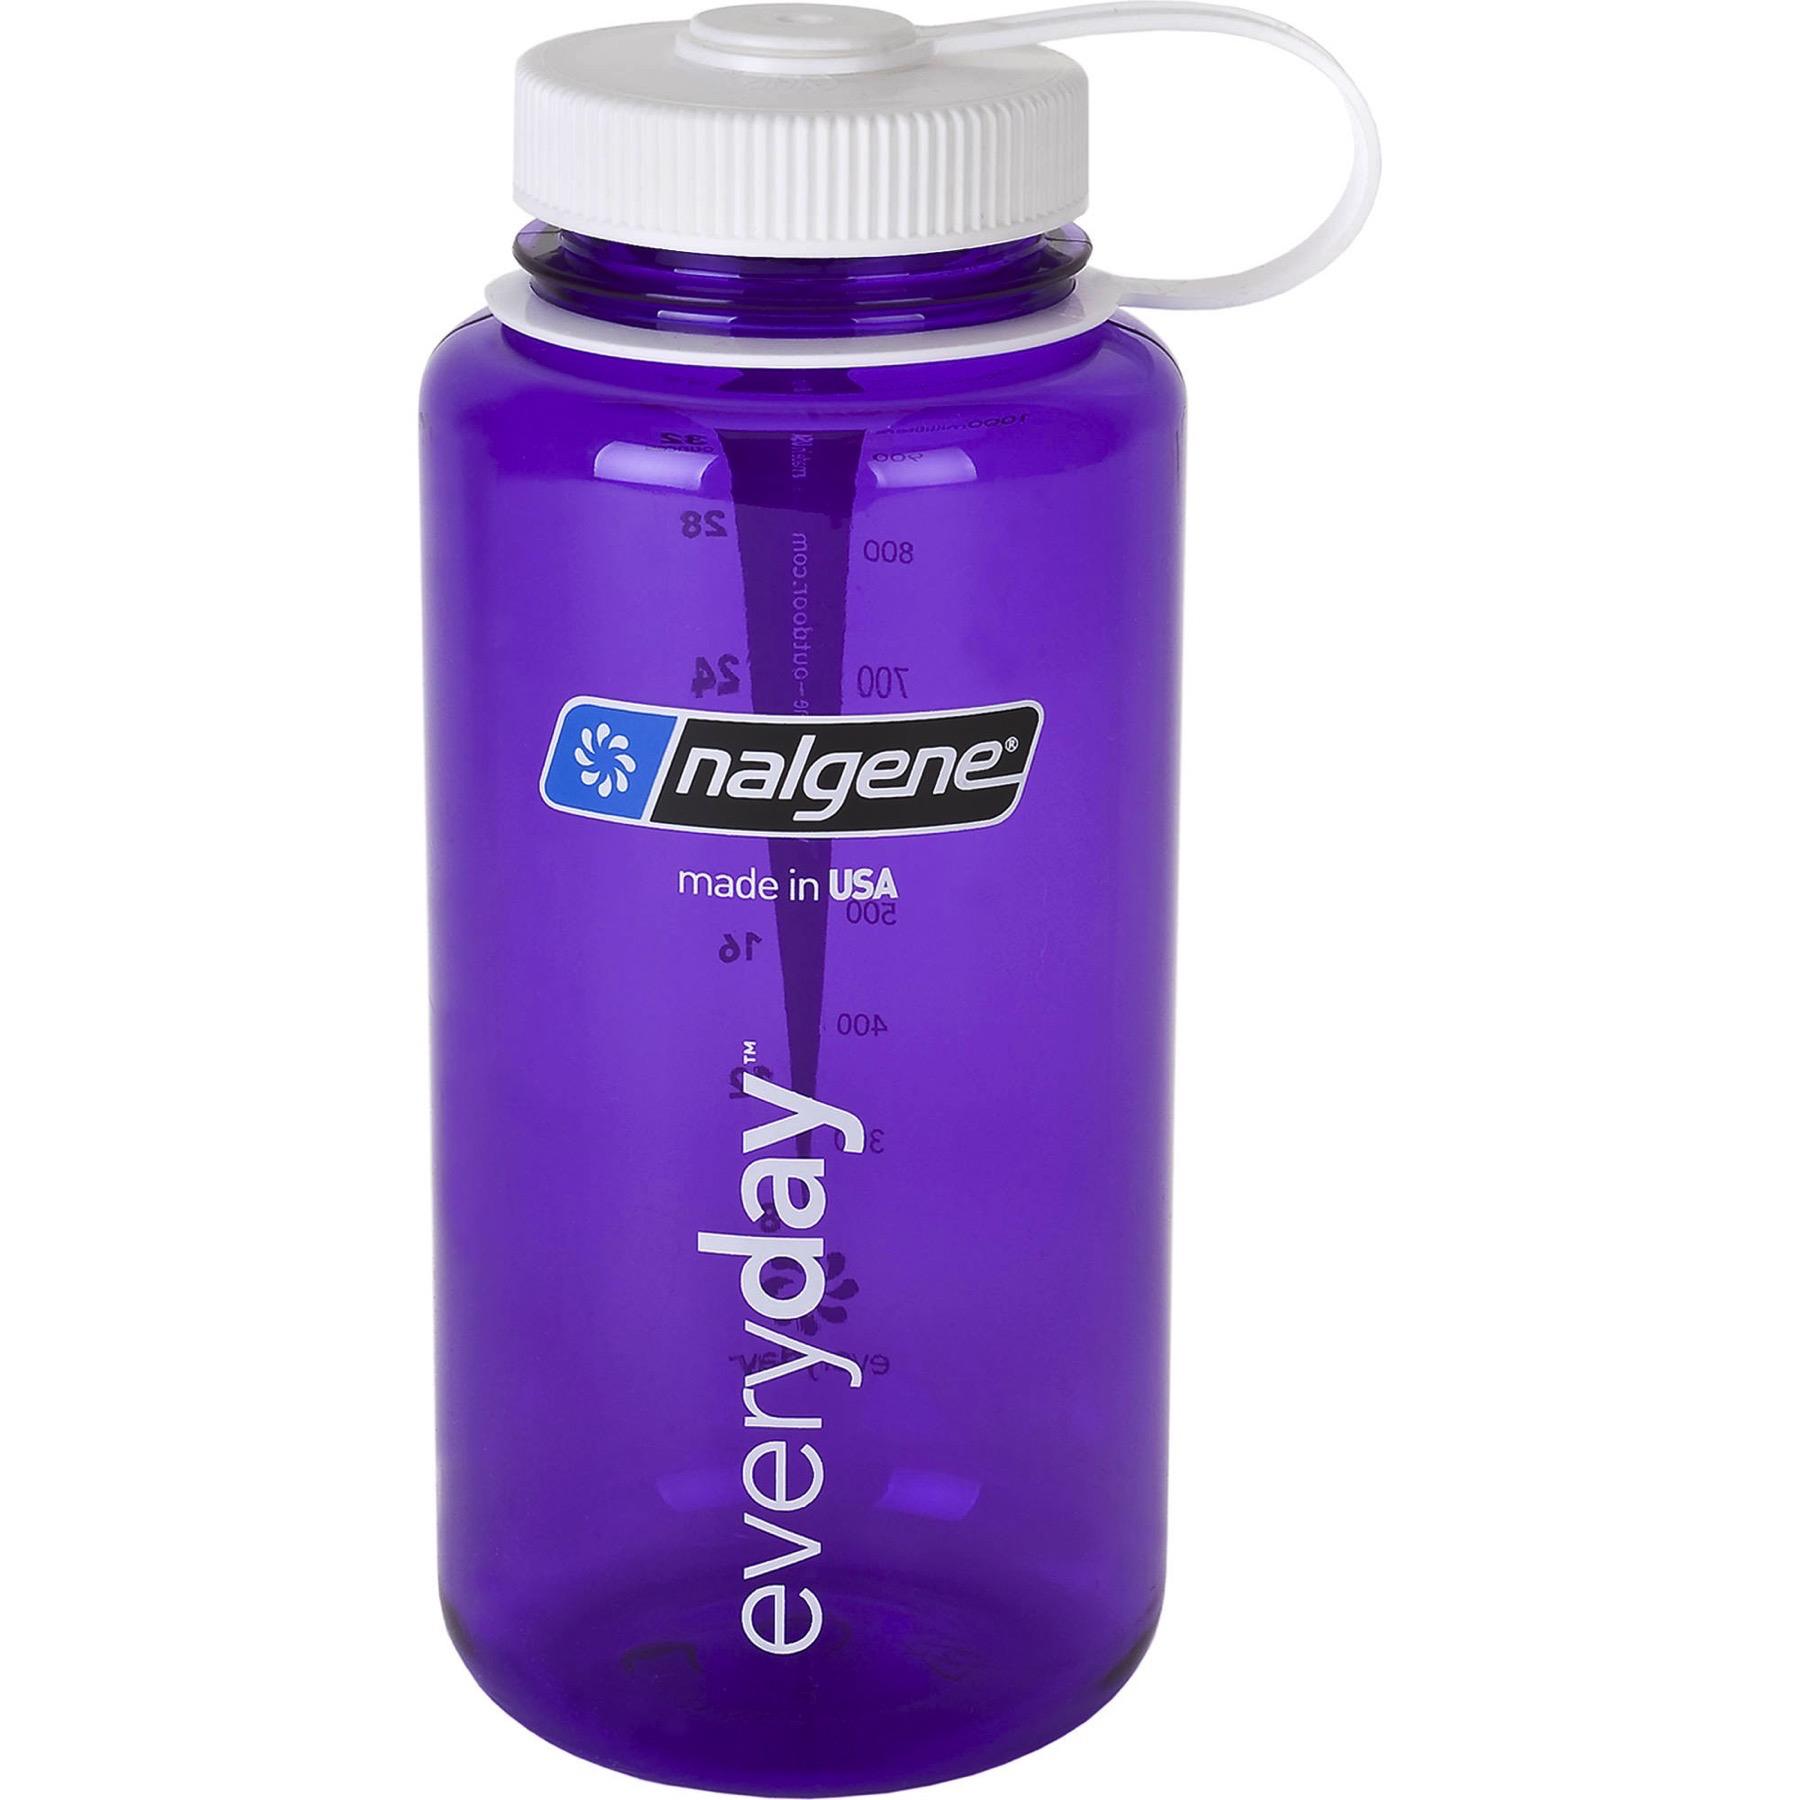 Nalgene Tritan 32oz Plastic Water Bottle Purple w/White ...